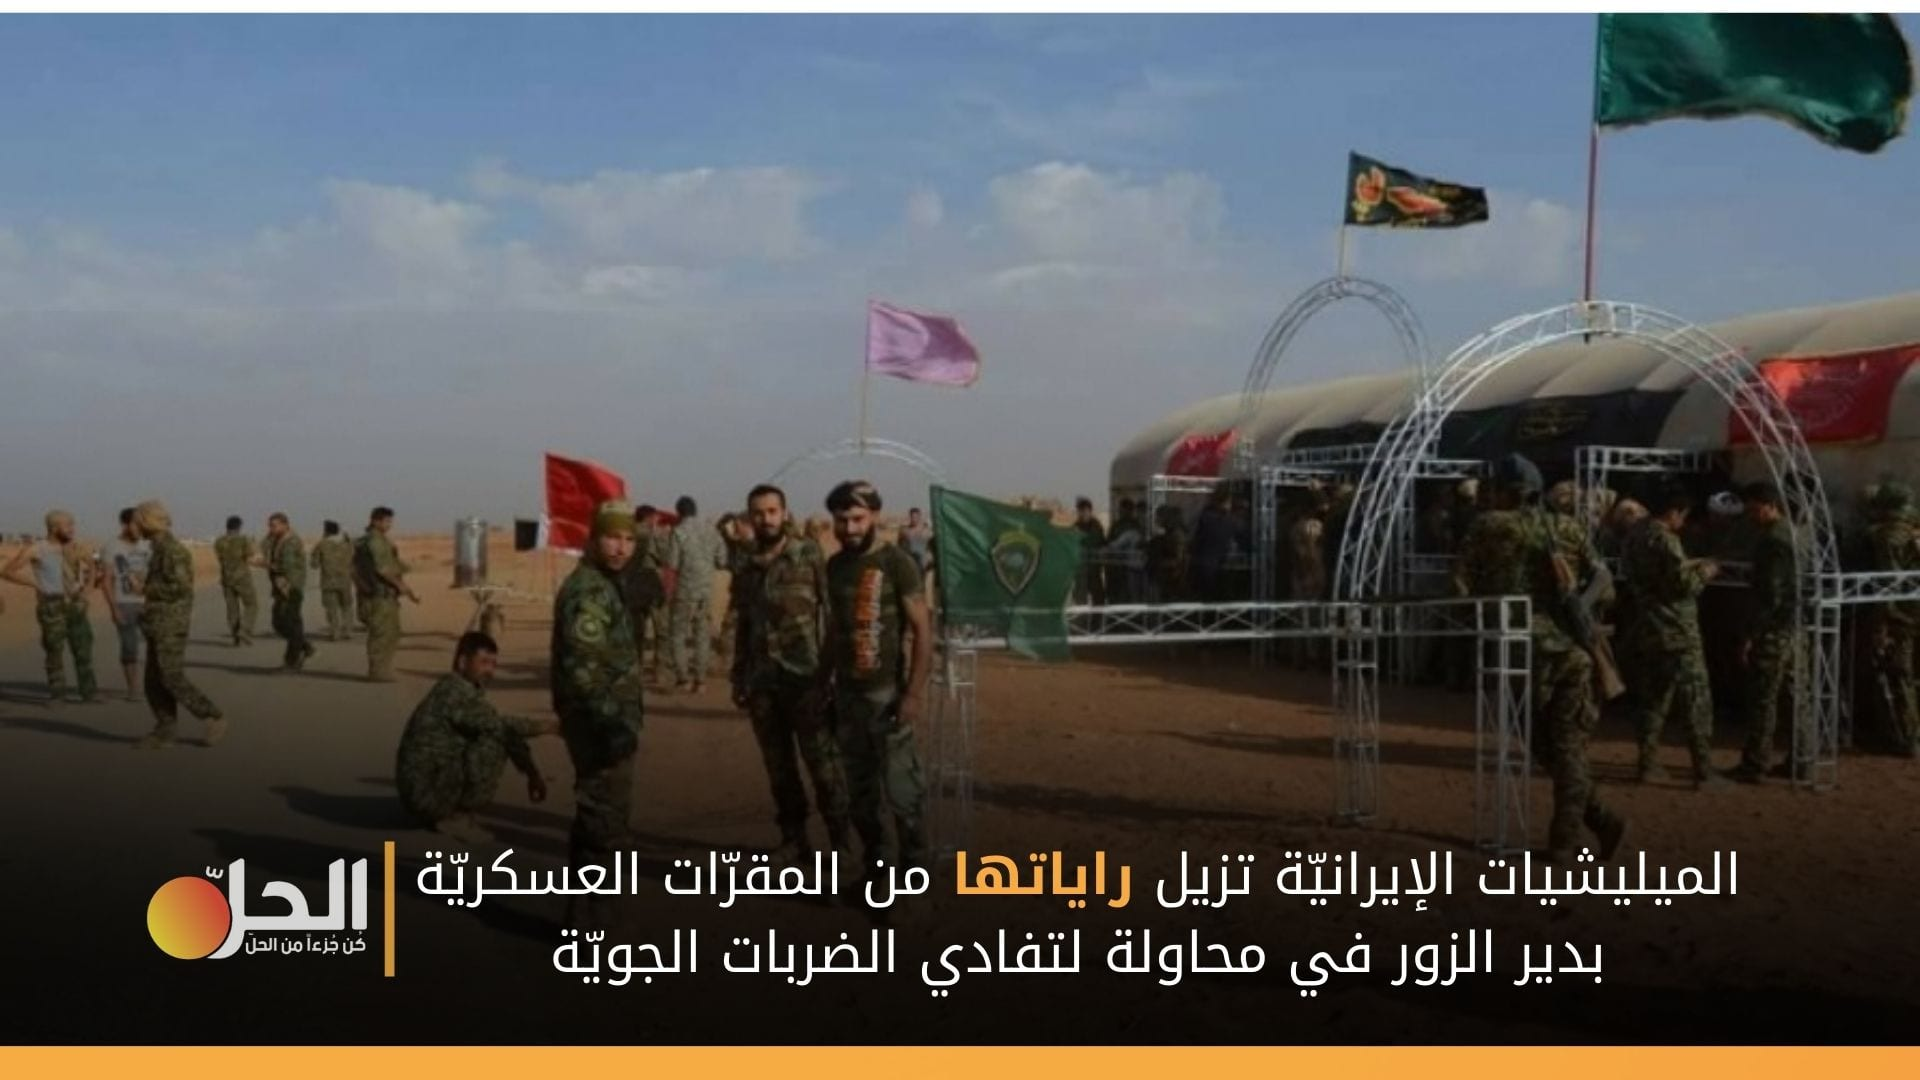 مليشيات إيران تستبدل راياتها بـ«العلم السوري» ضمن مناطق انتشارها بديرالزور